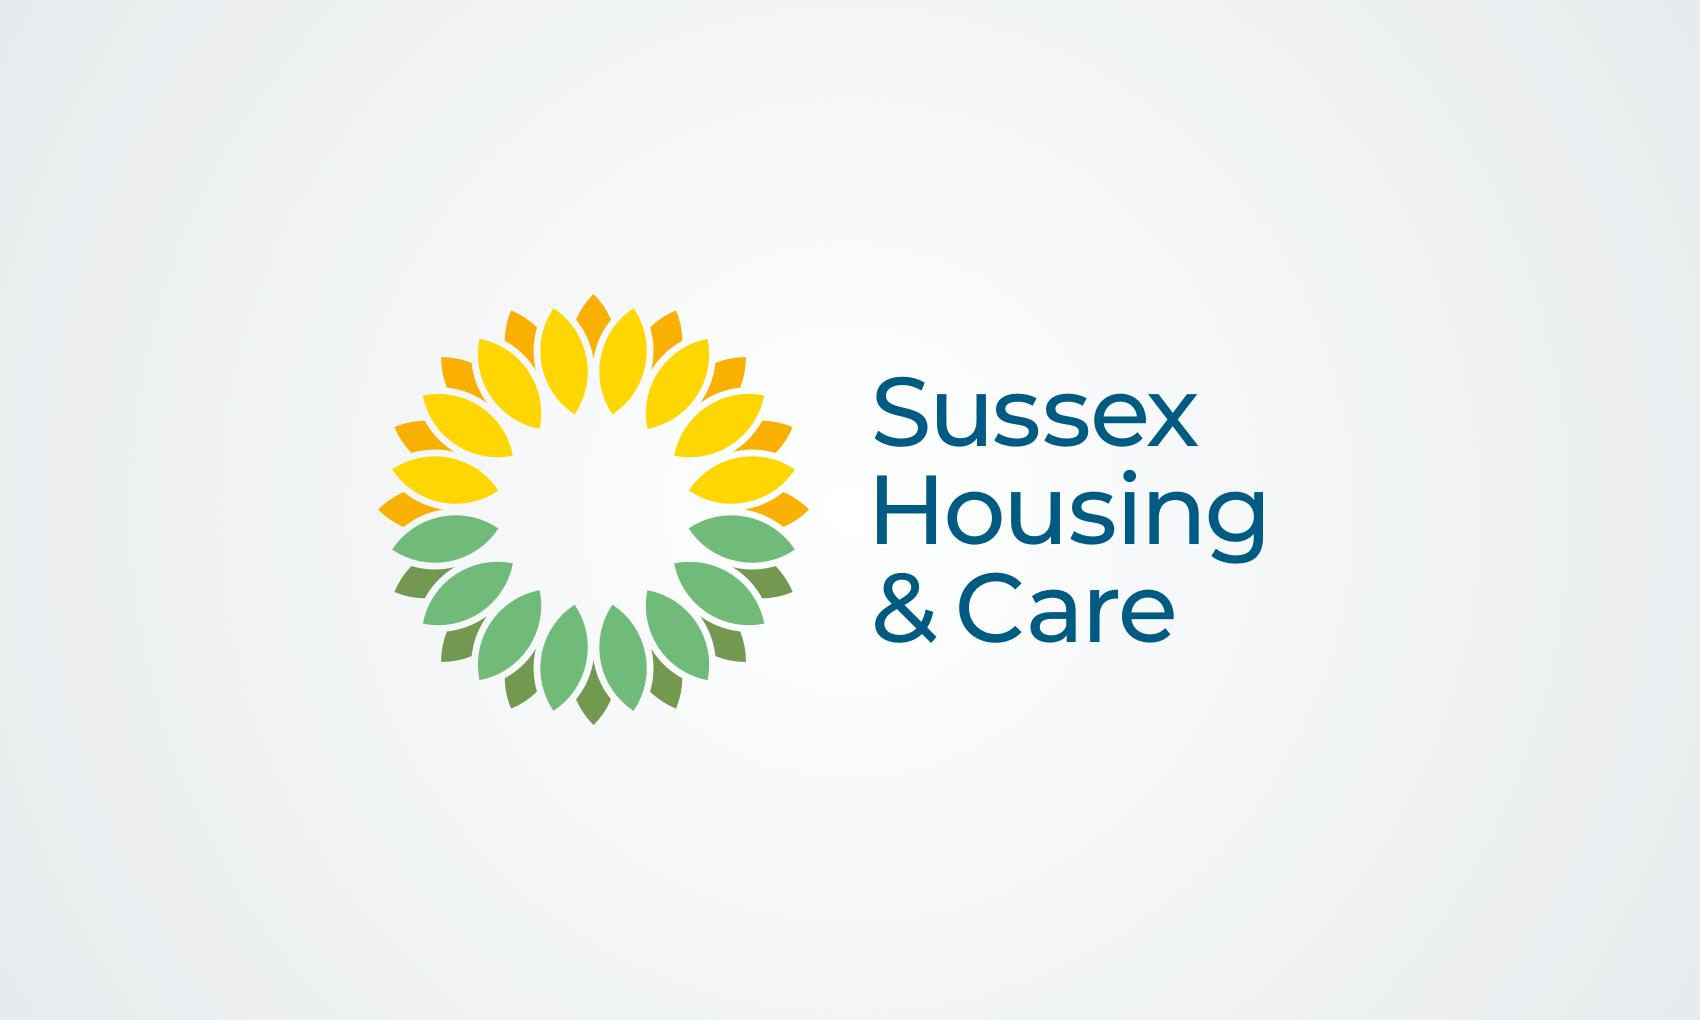 Sussex Housing & Care brand identity